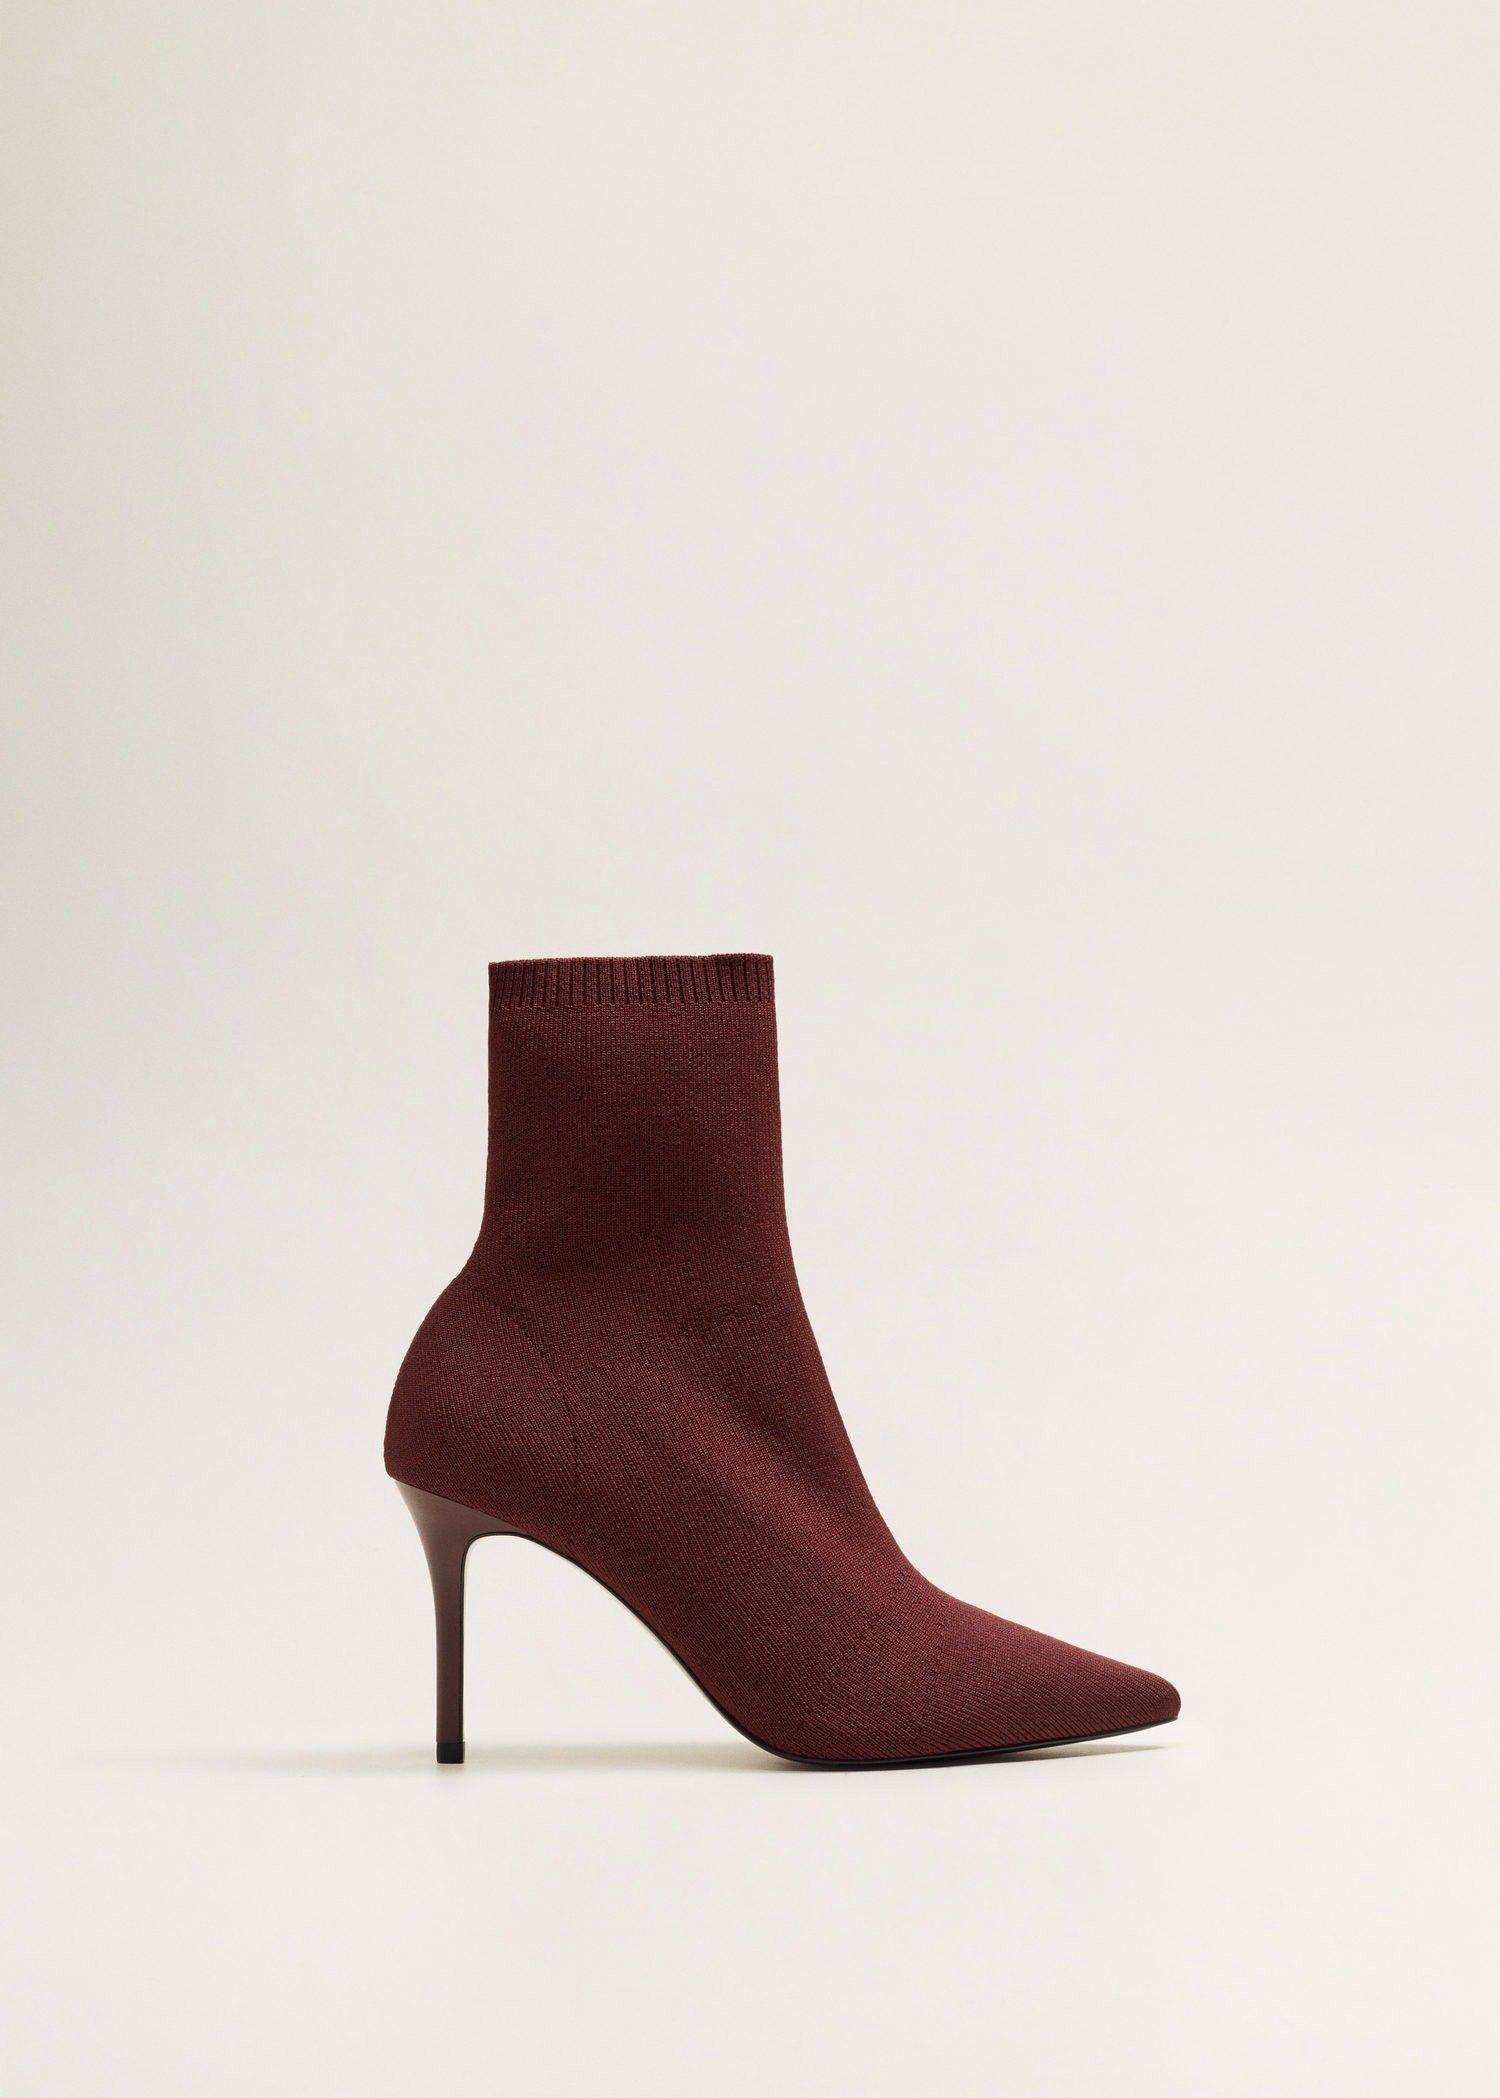 529b22cbd359 Mango Heel Sock Boots - Black 8½